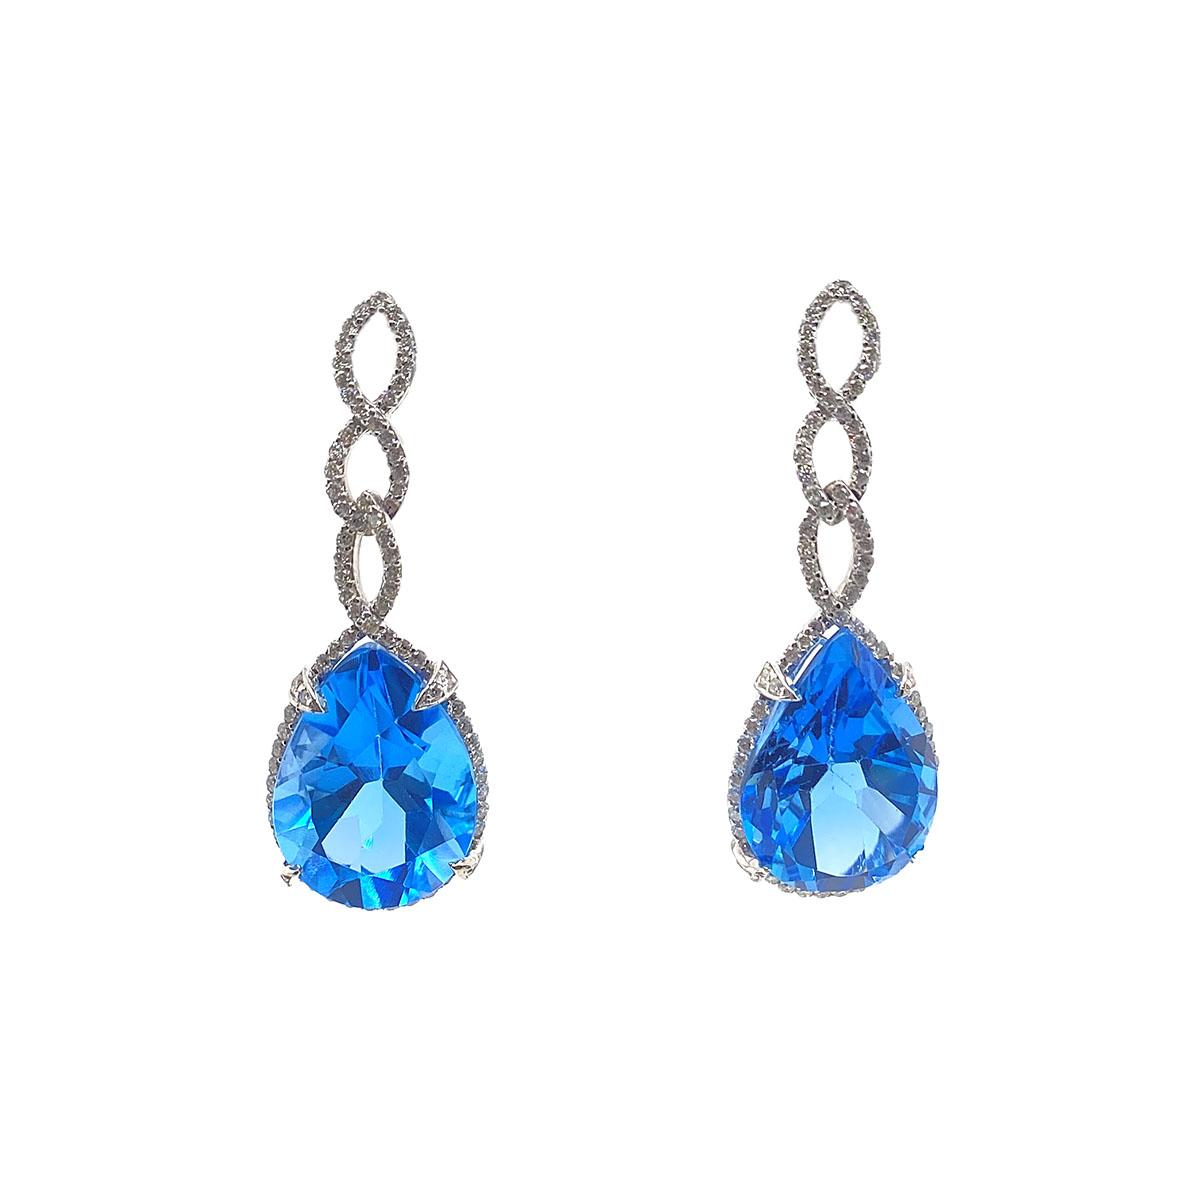 14 Karat White Gold Pear Shaped Blue Topaz and Diamond Earrings